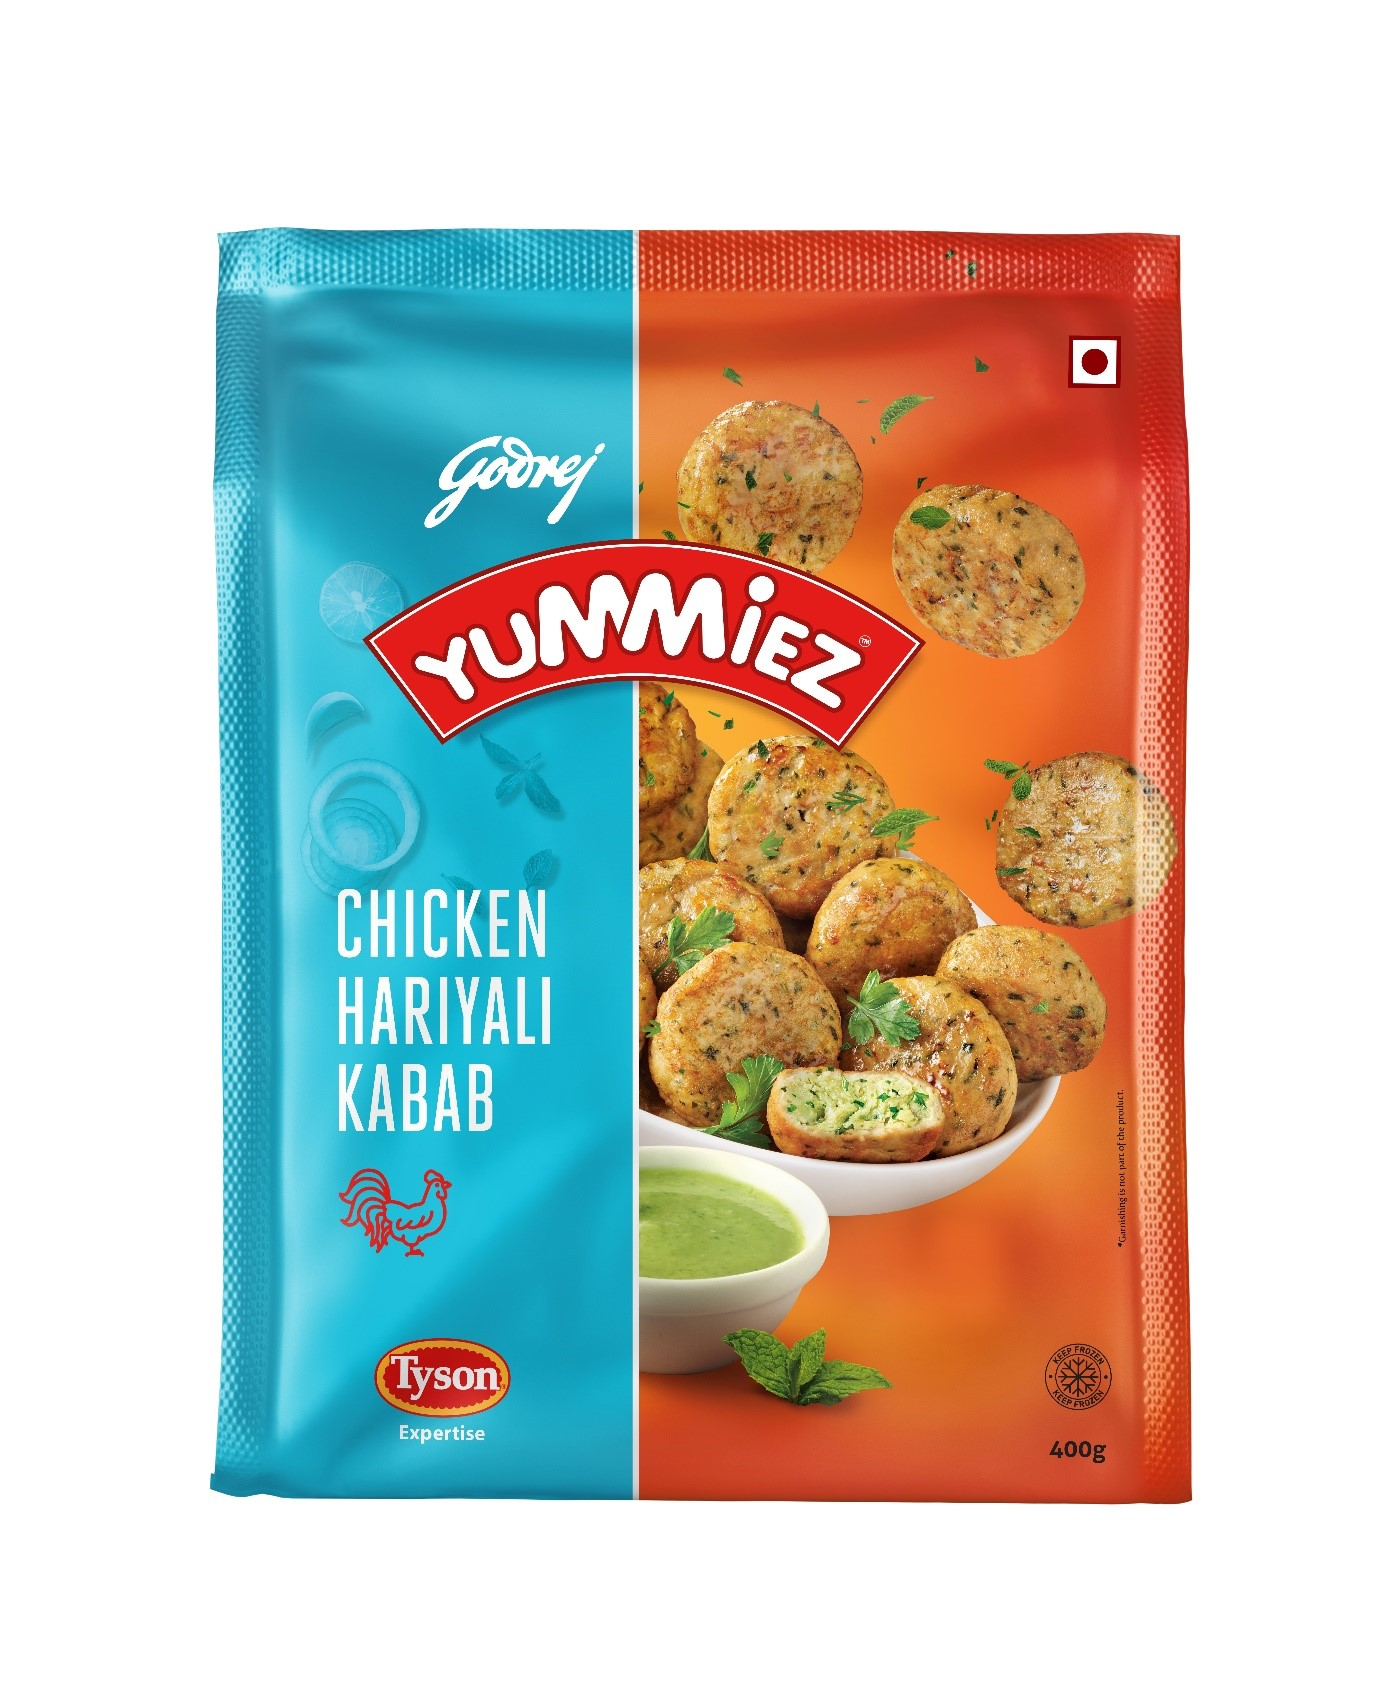 Yummiez Chicken Hariyali Kabab 400 g